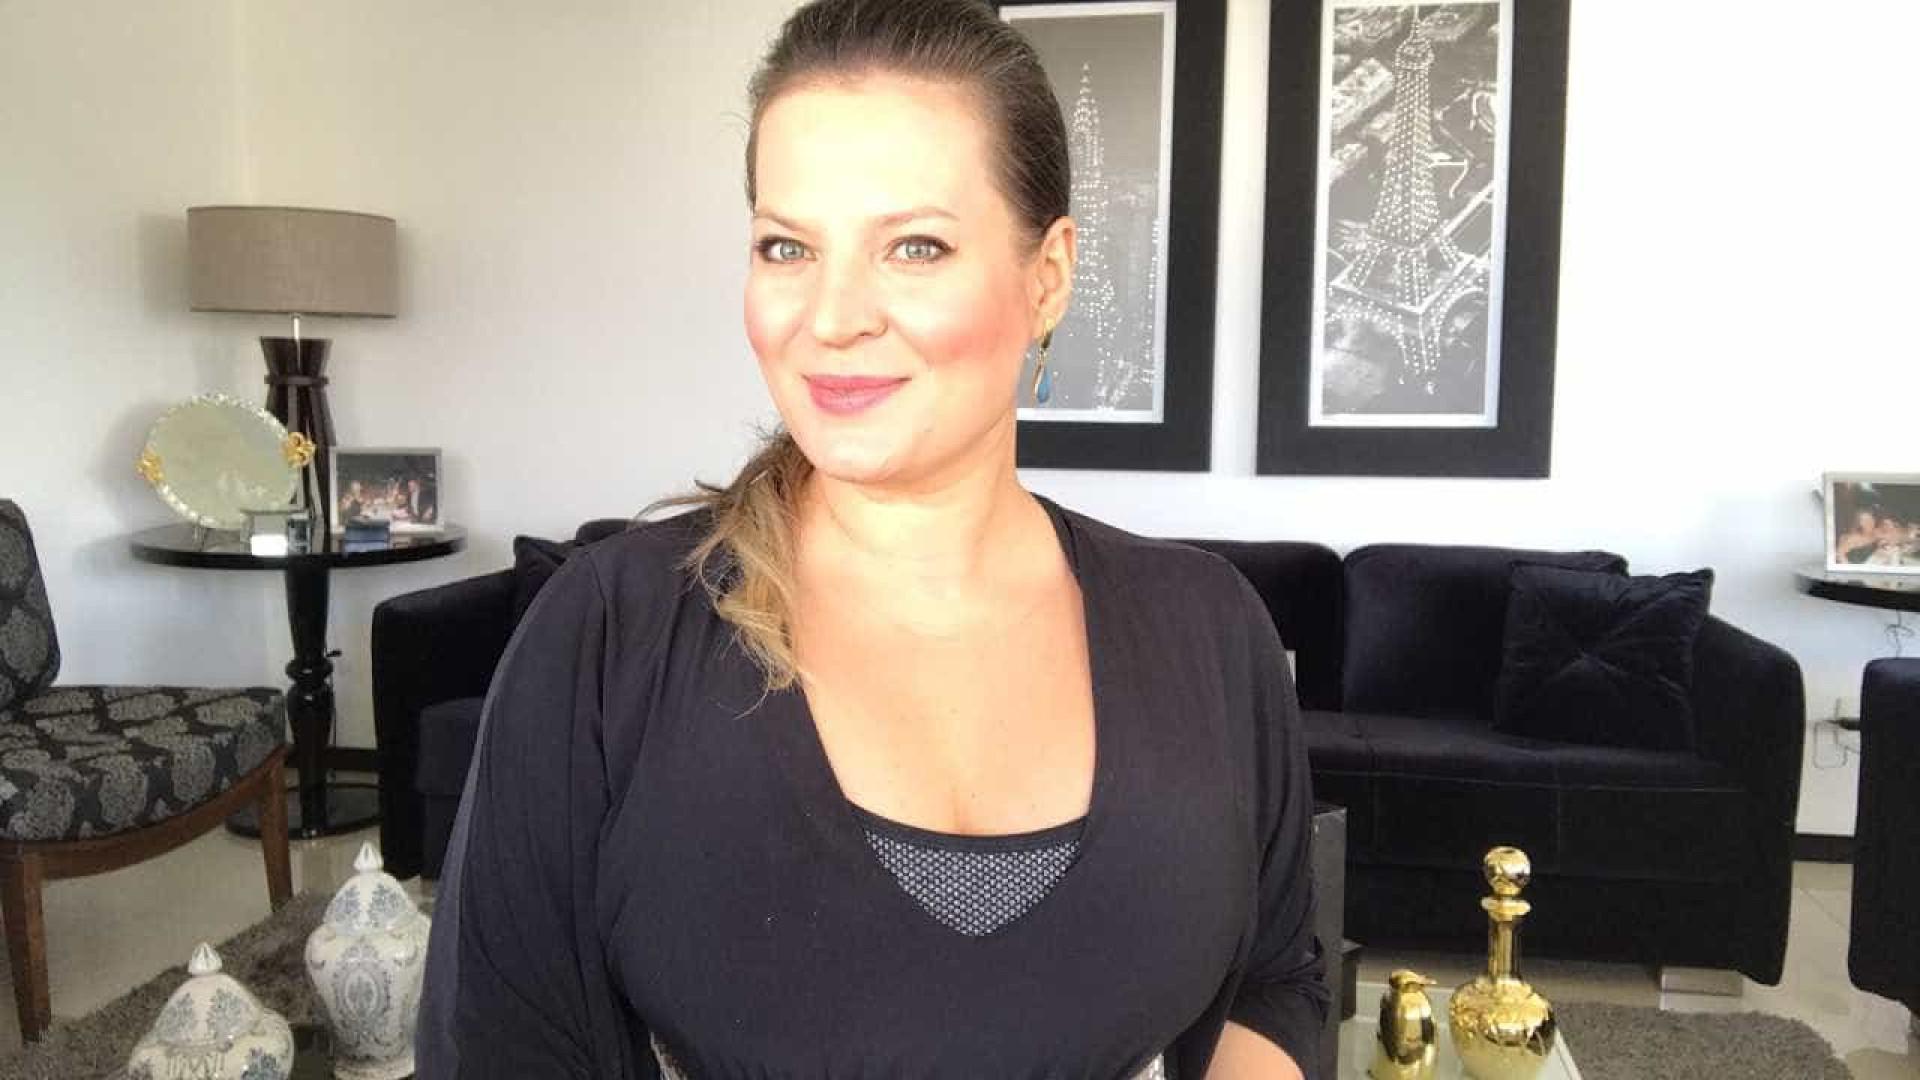 Após bate-boca, Joice Hasselmann pede desculpas em grupo de WhatsApp